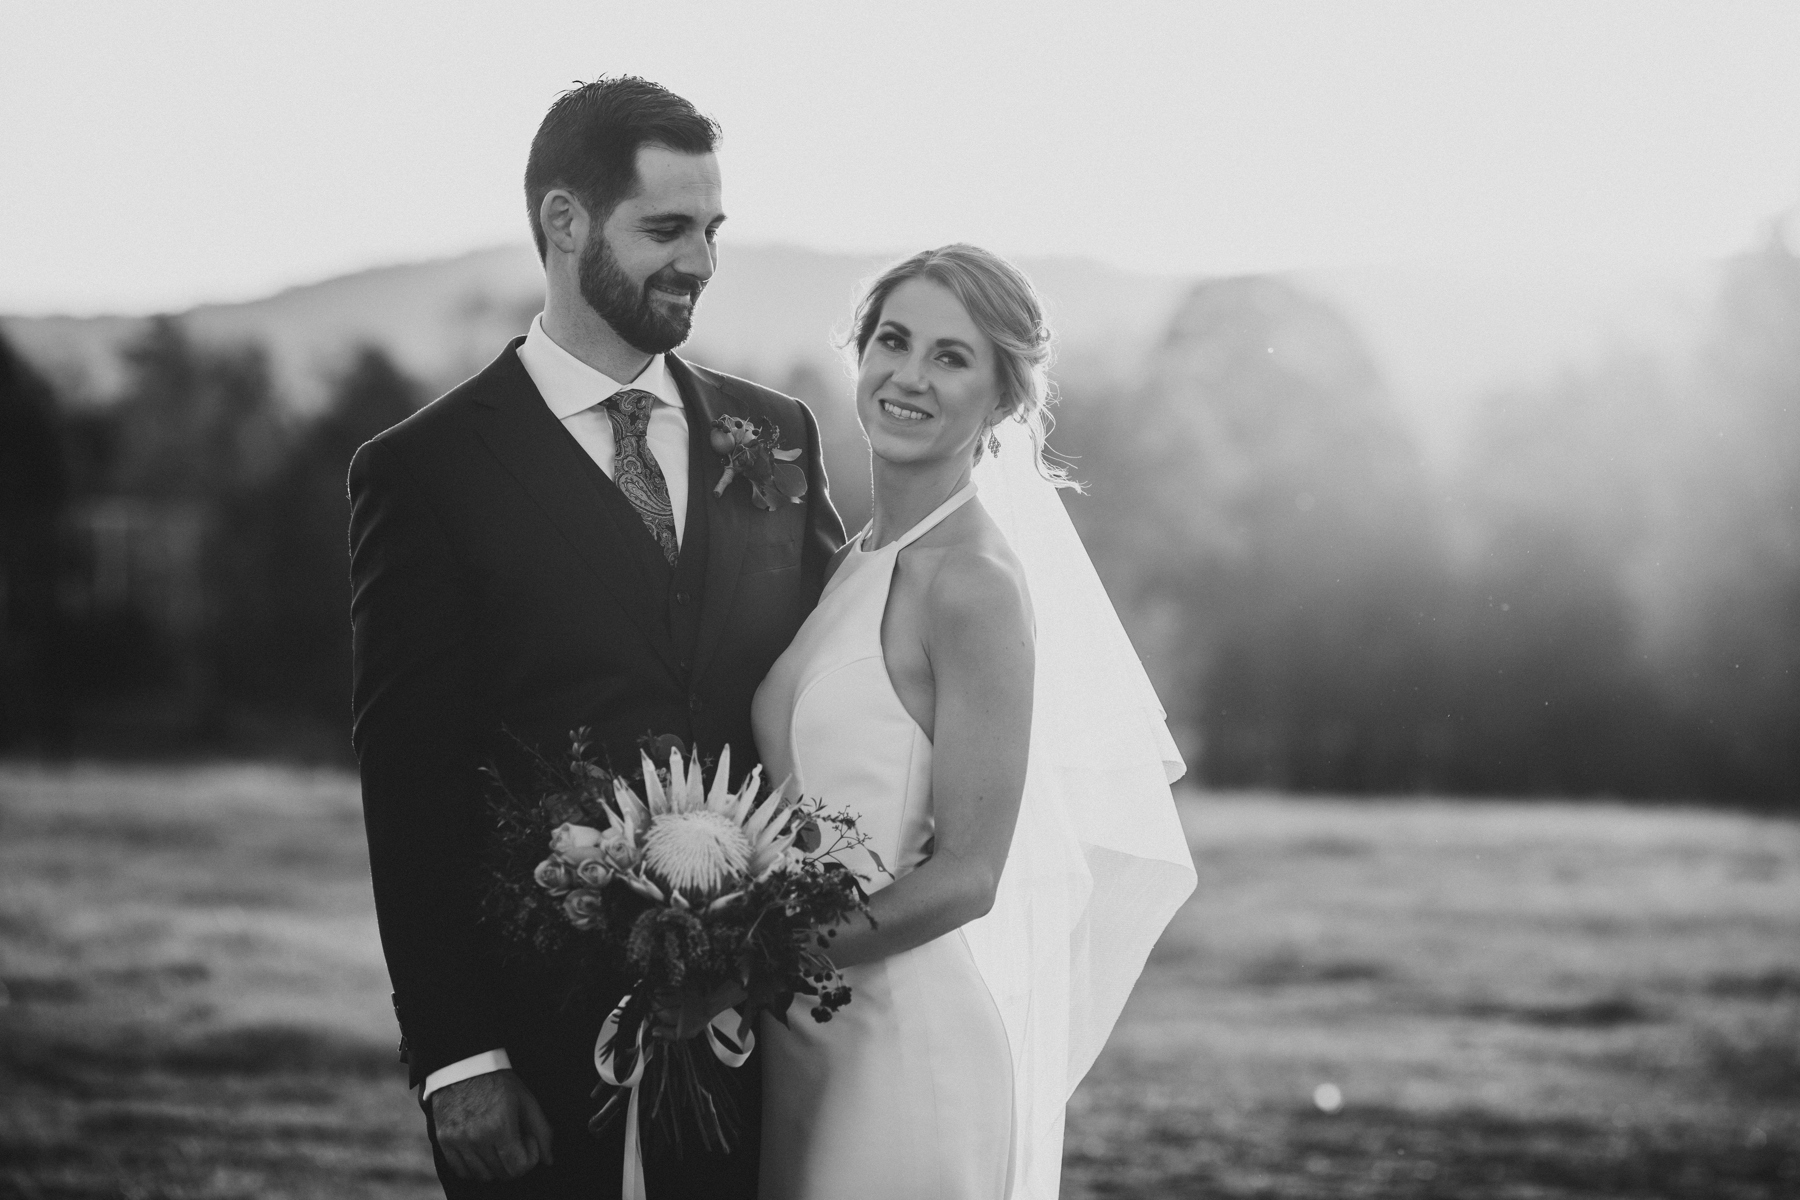 spicers-hiddenvale-wedding-101A.JPG